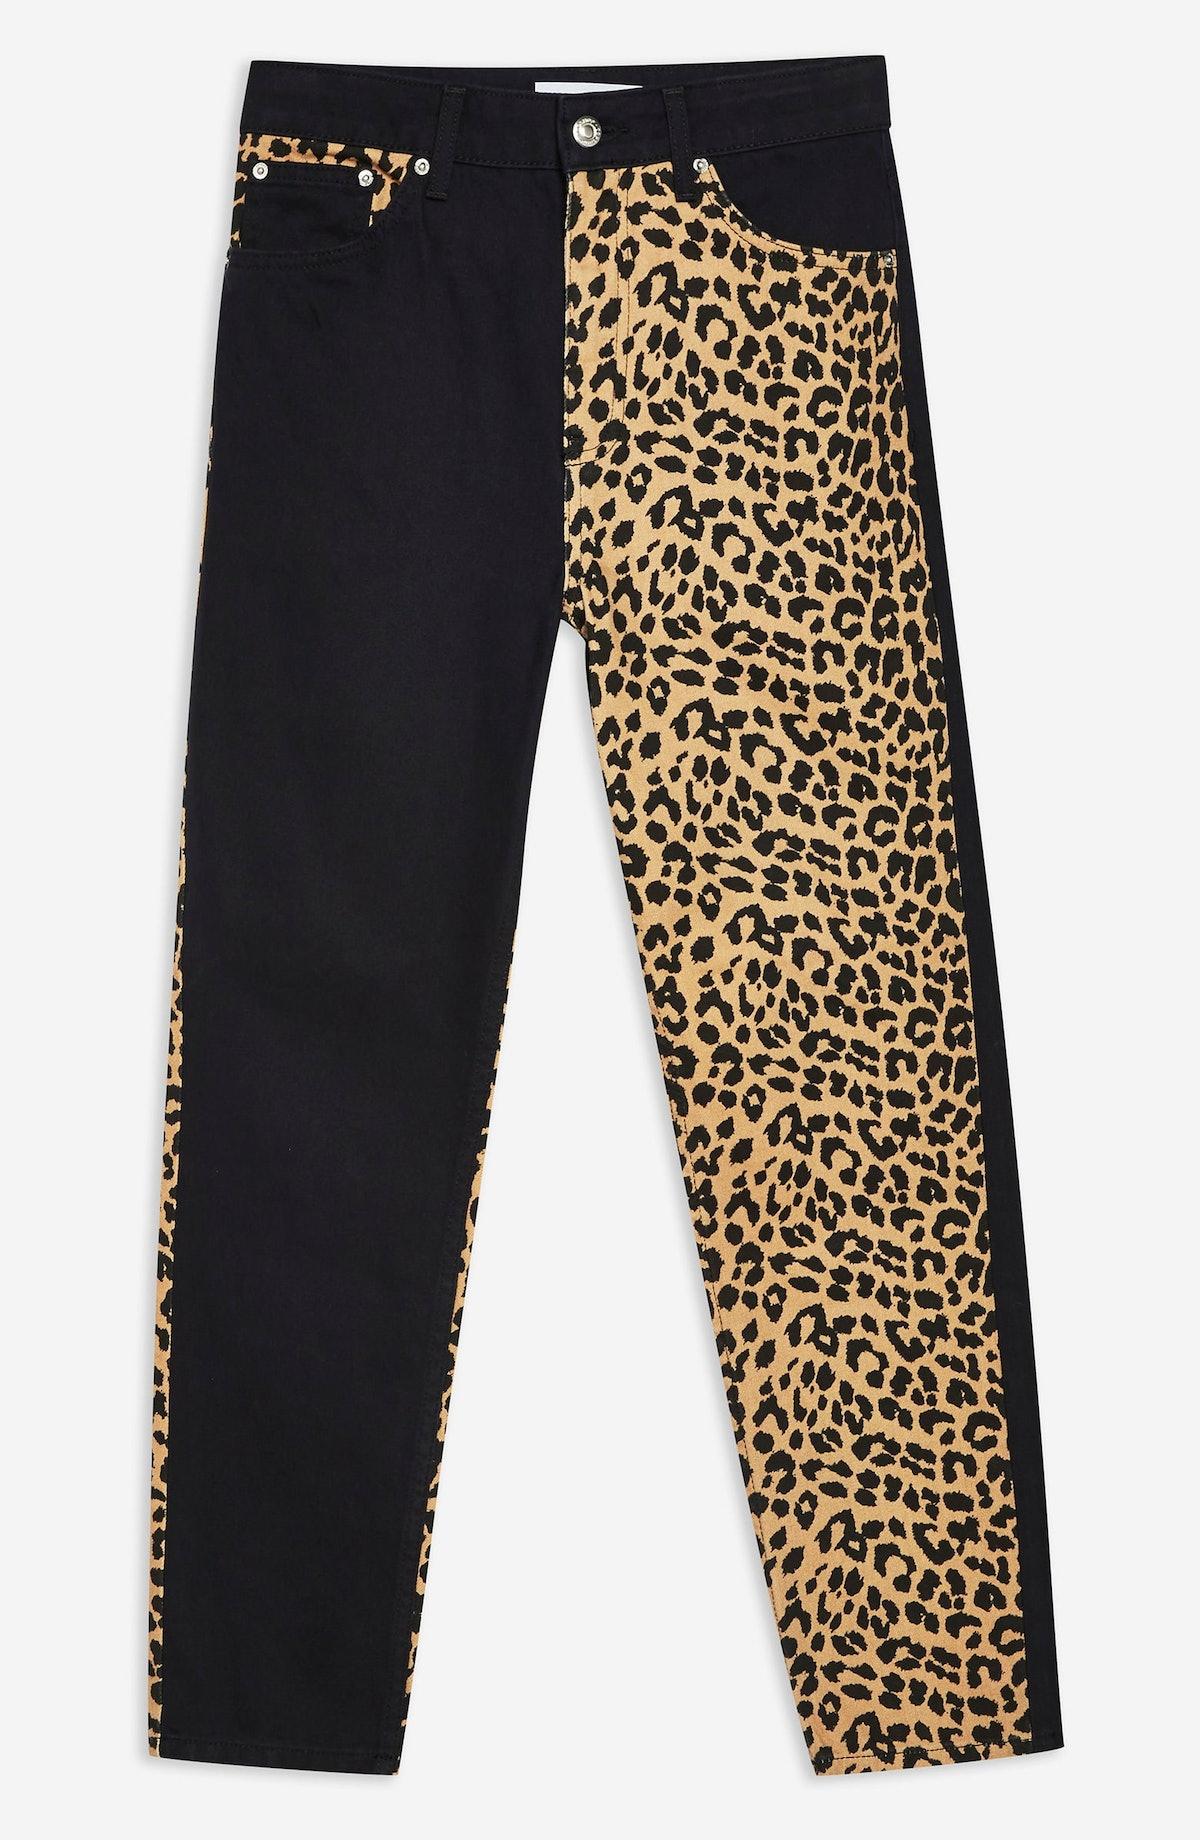 Topshop Leopard Panel Mom Jeans